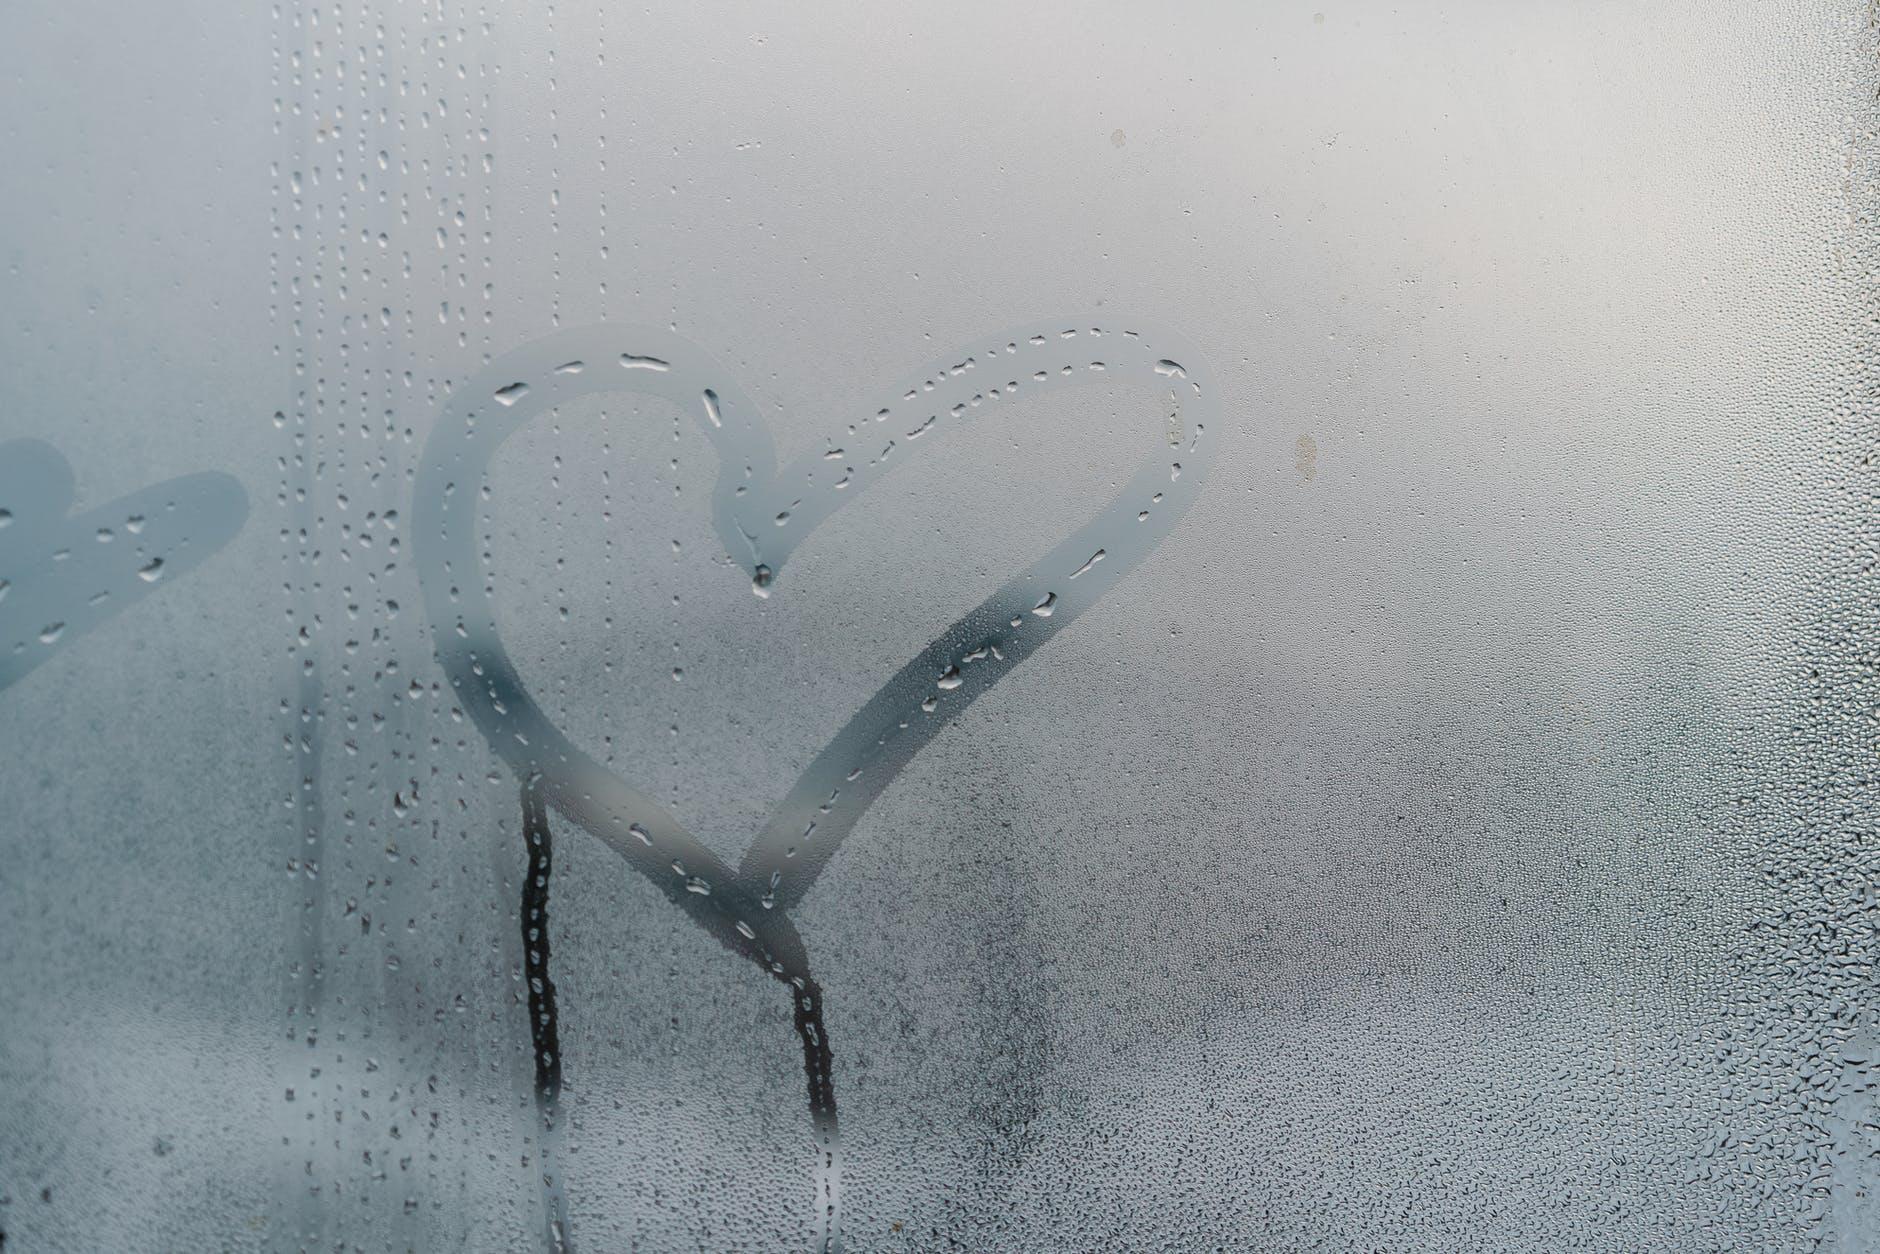 heart drawn into a steamy window